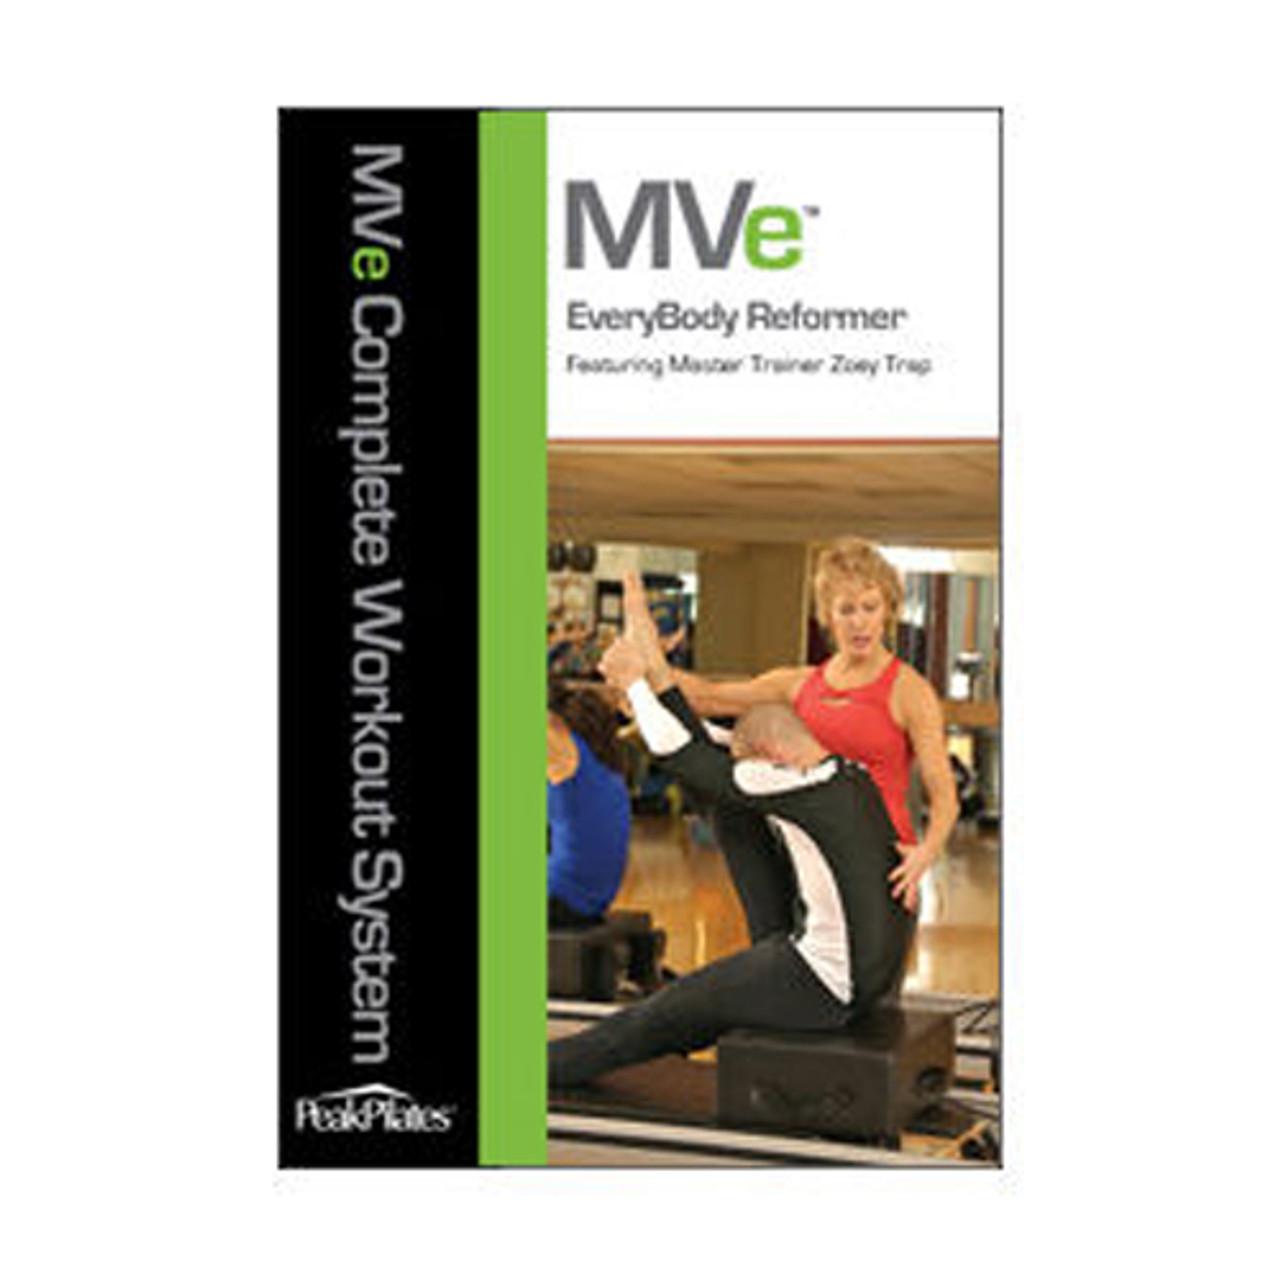 MVe® EveryBody Reformer Workout DVD